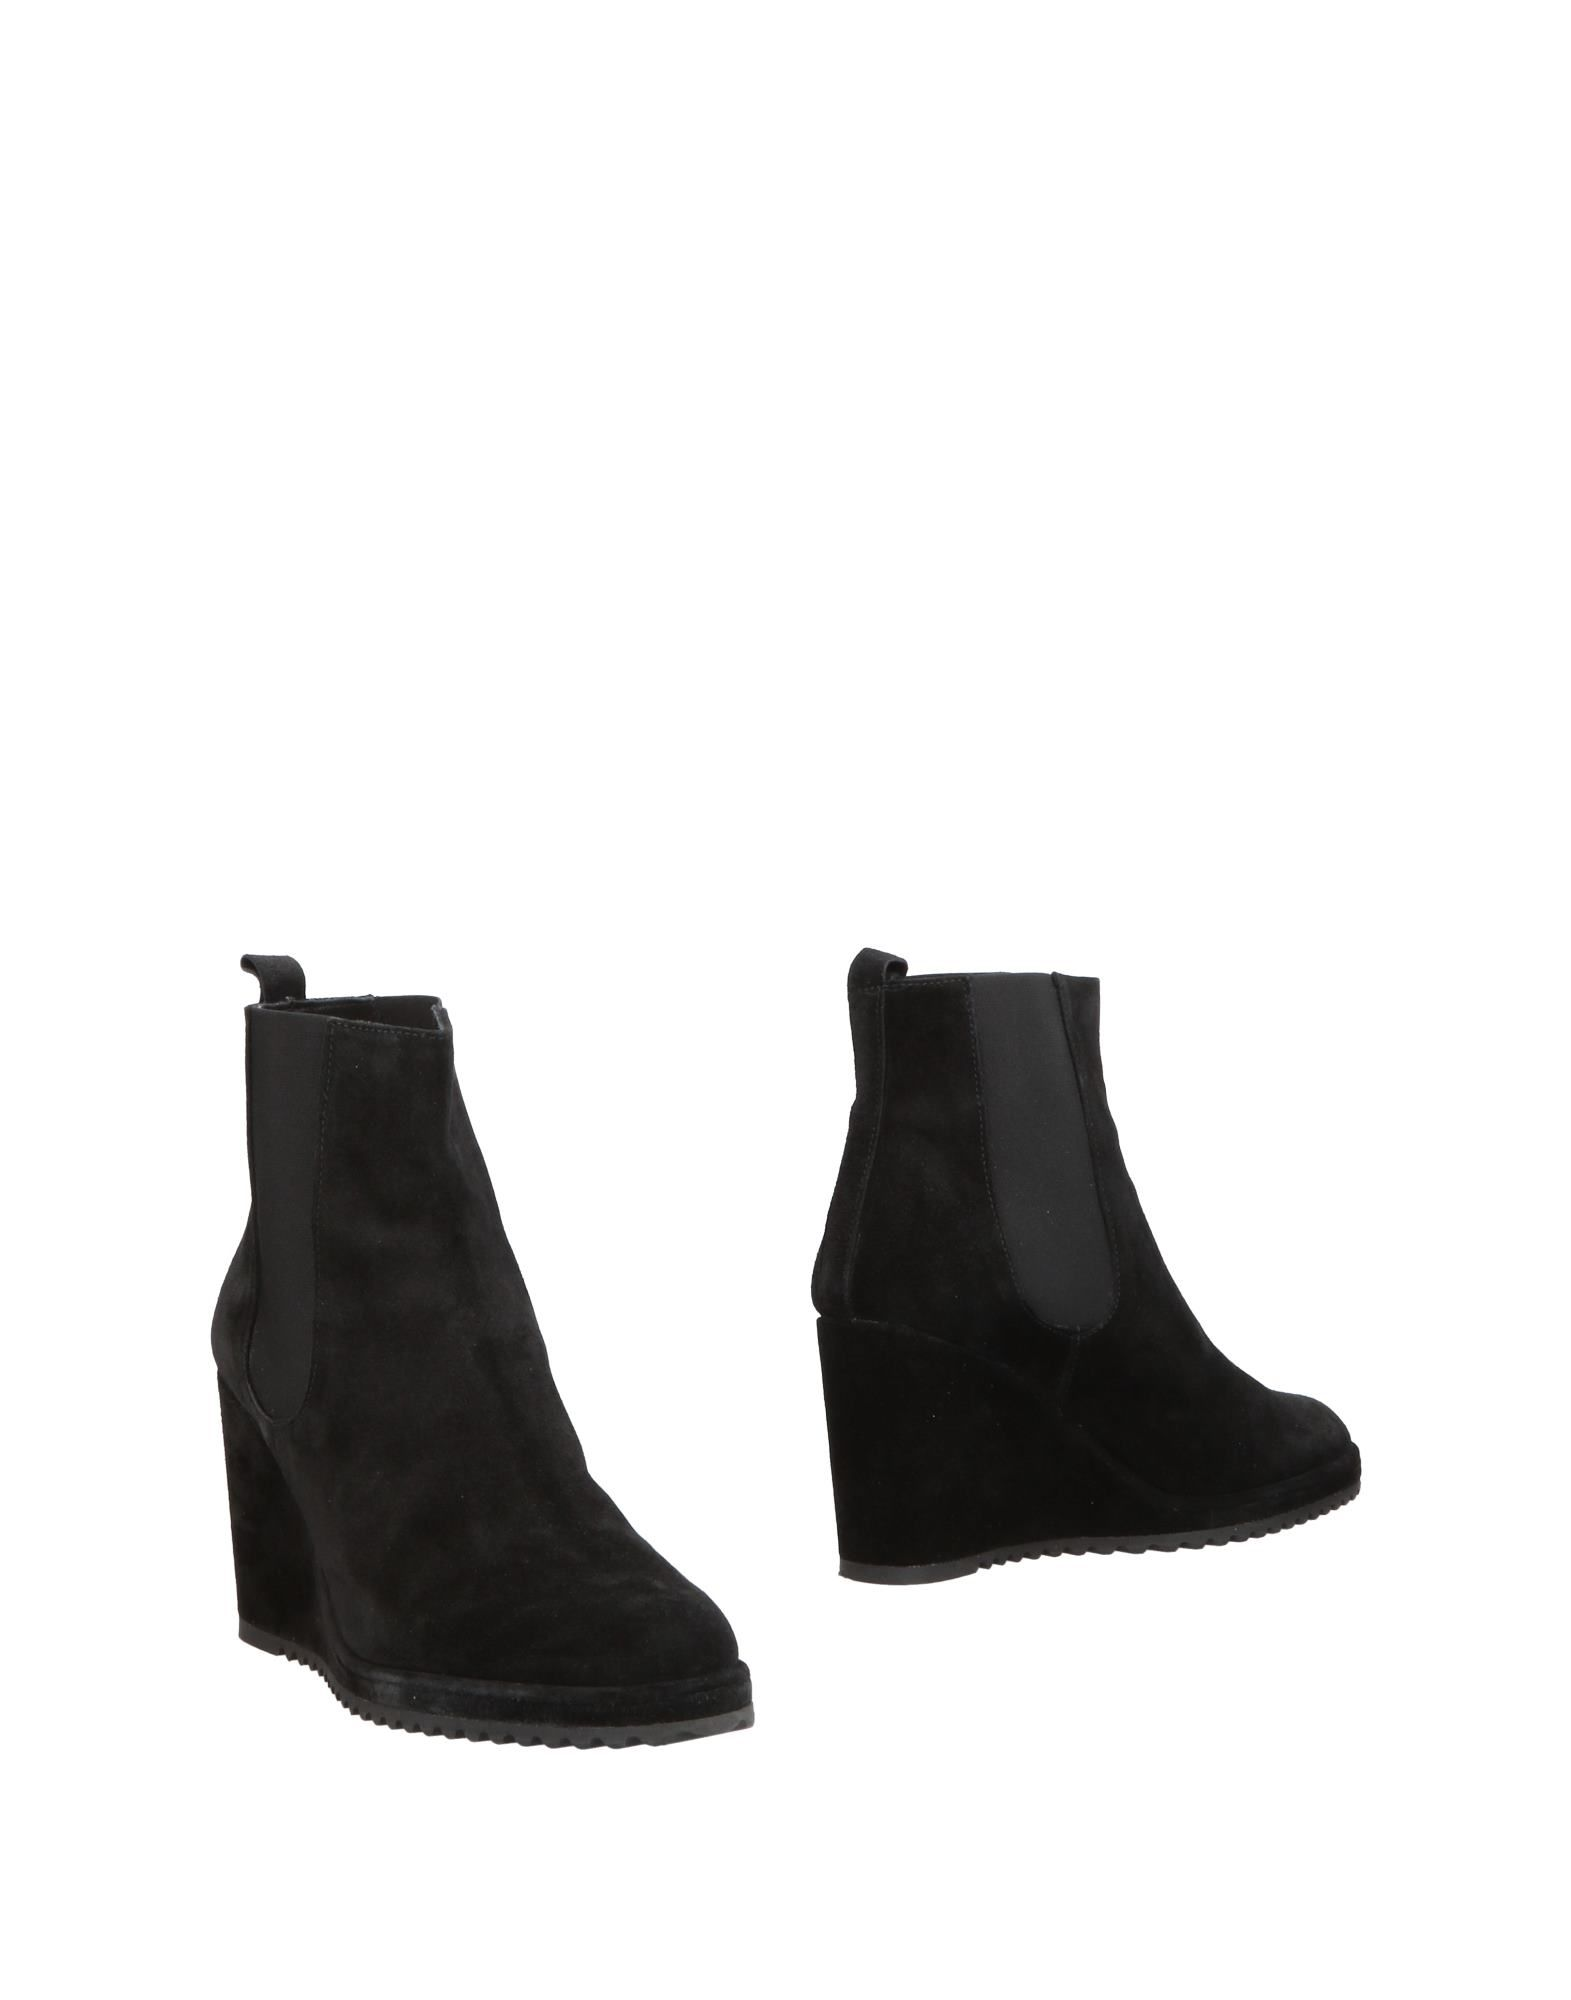 Stilvolle billige Schuhe Castañer Chelsea Boots Damen Damen Damen  11507548XO 5a4835